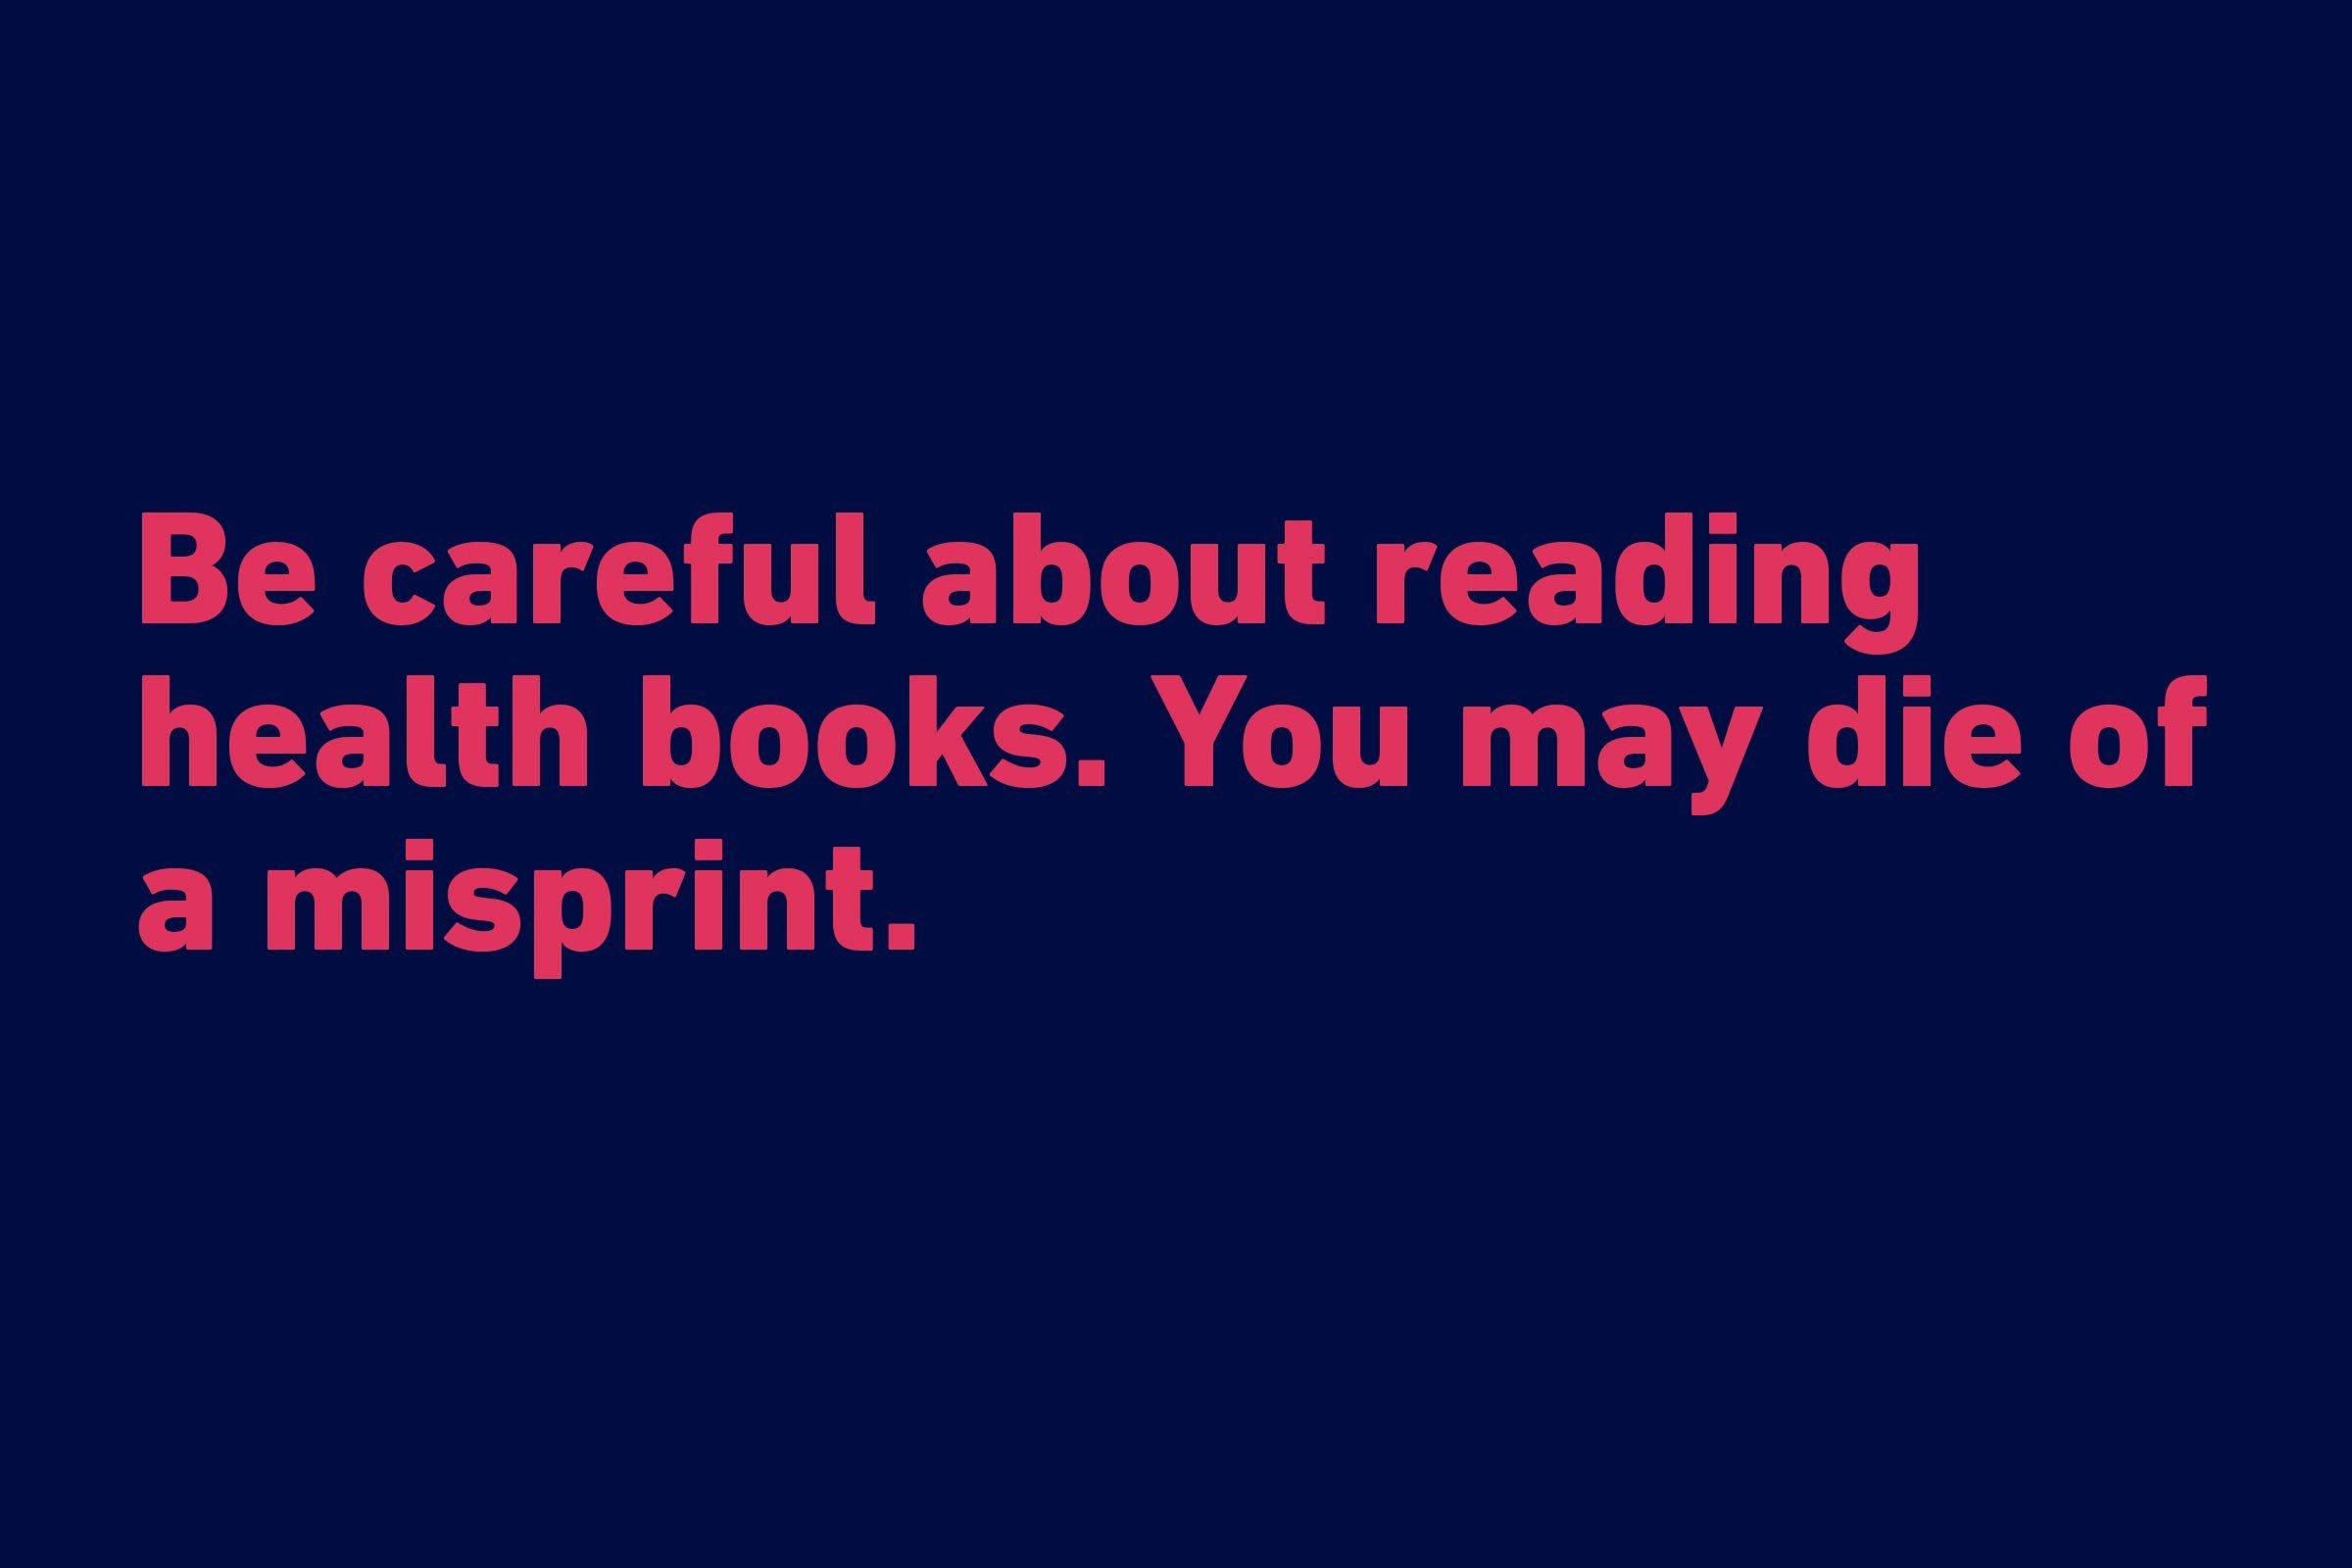 reading health books